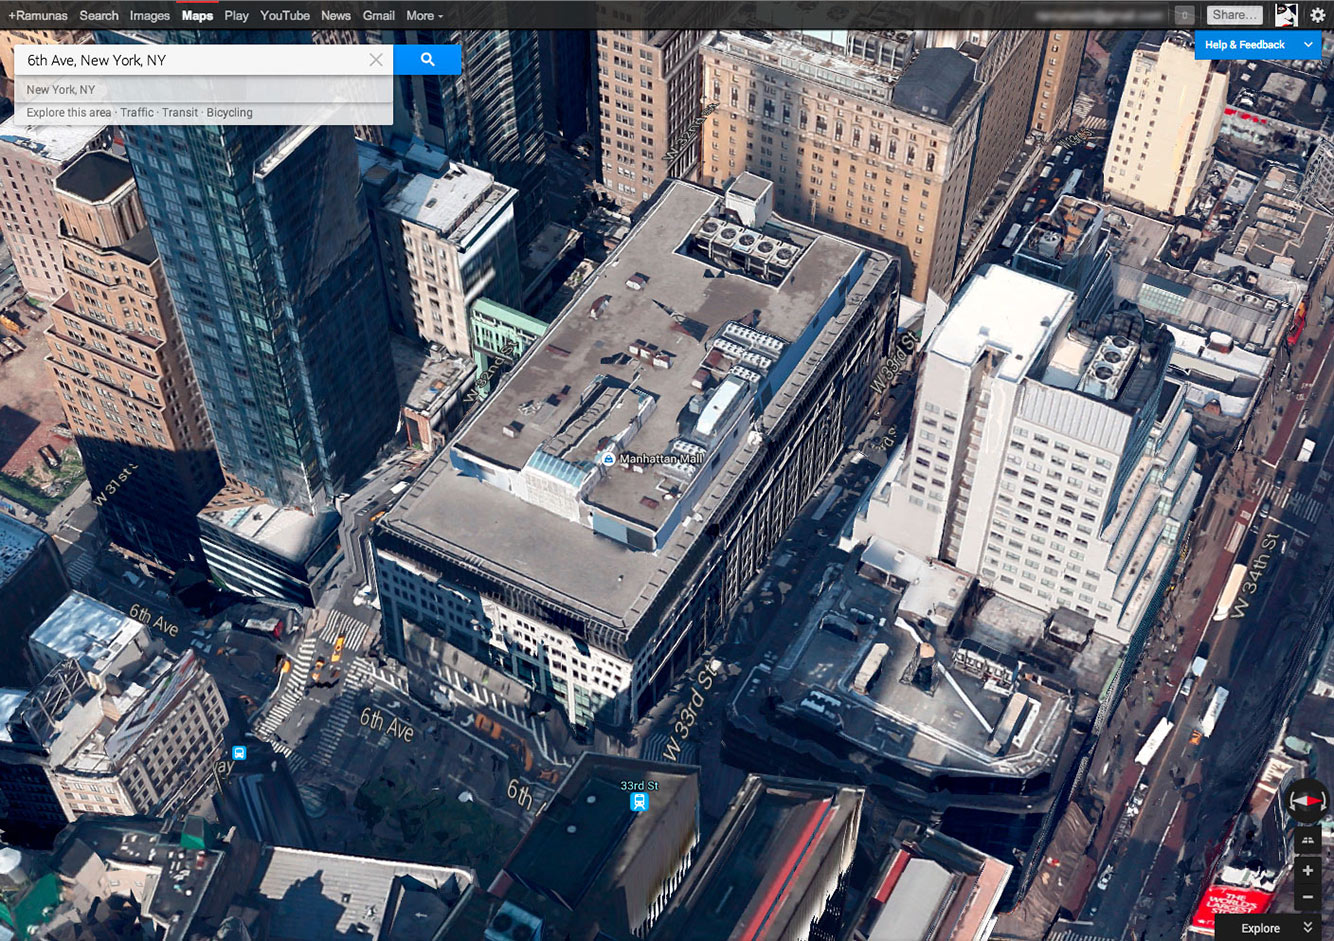 Google 3D žemėlapiai - 6a aveniu Niujorke